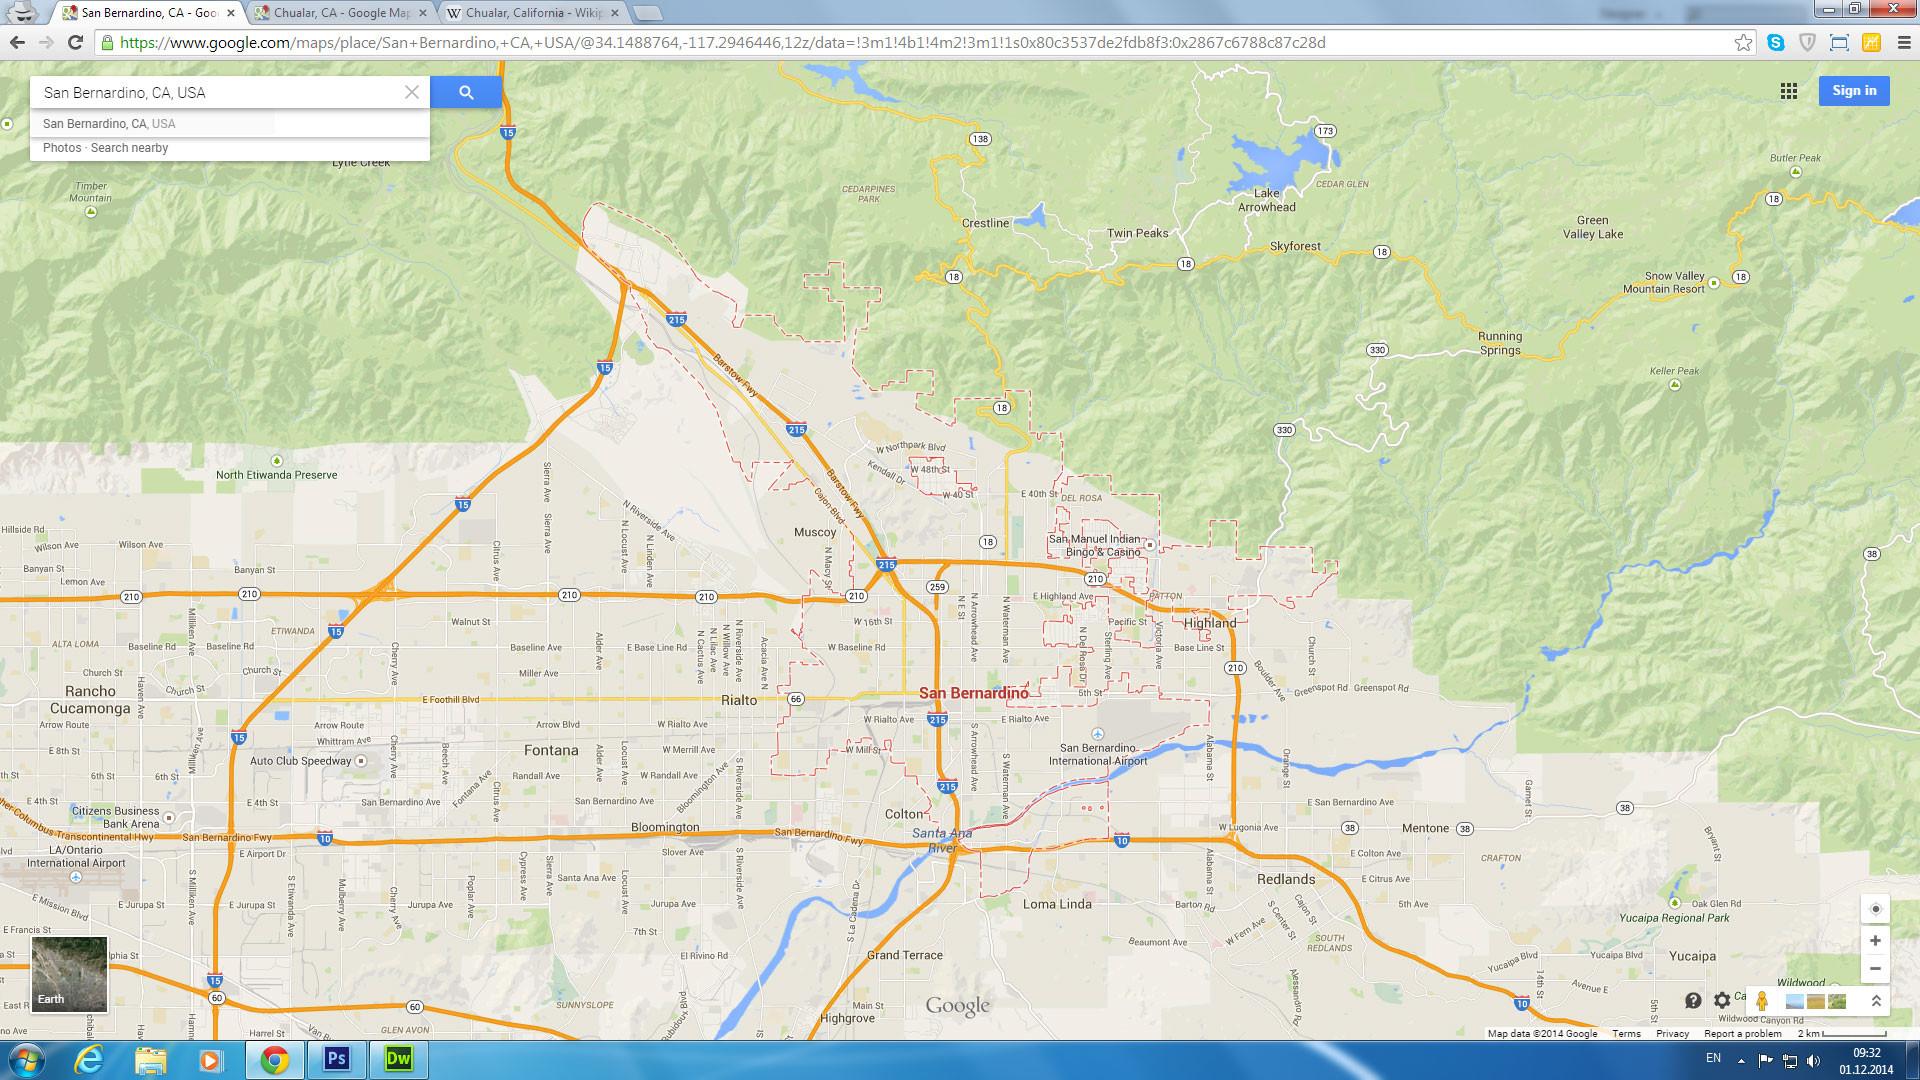 Map Of San Bernardino County Cities Printable San Bernardino - Map Of Cities In San Bernardino County California